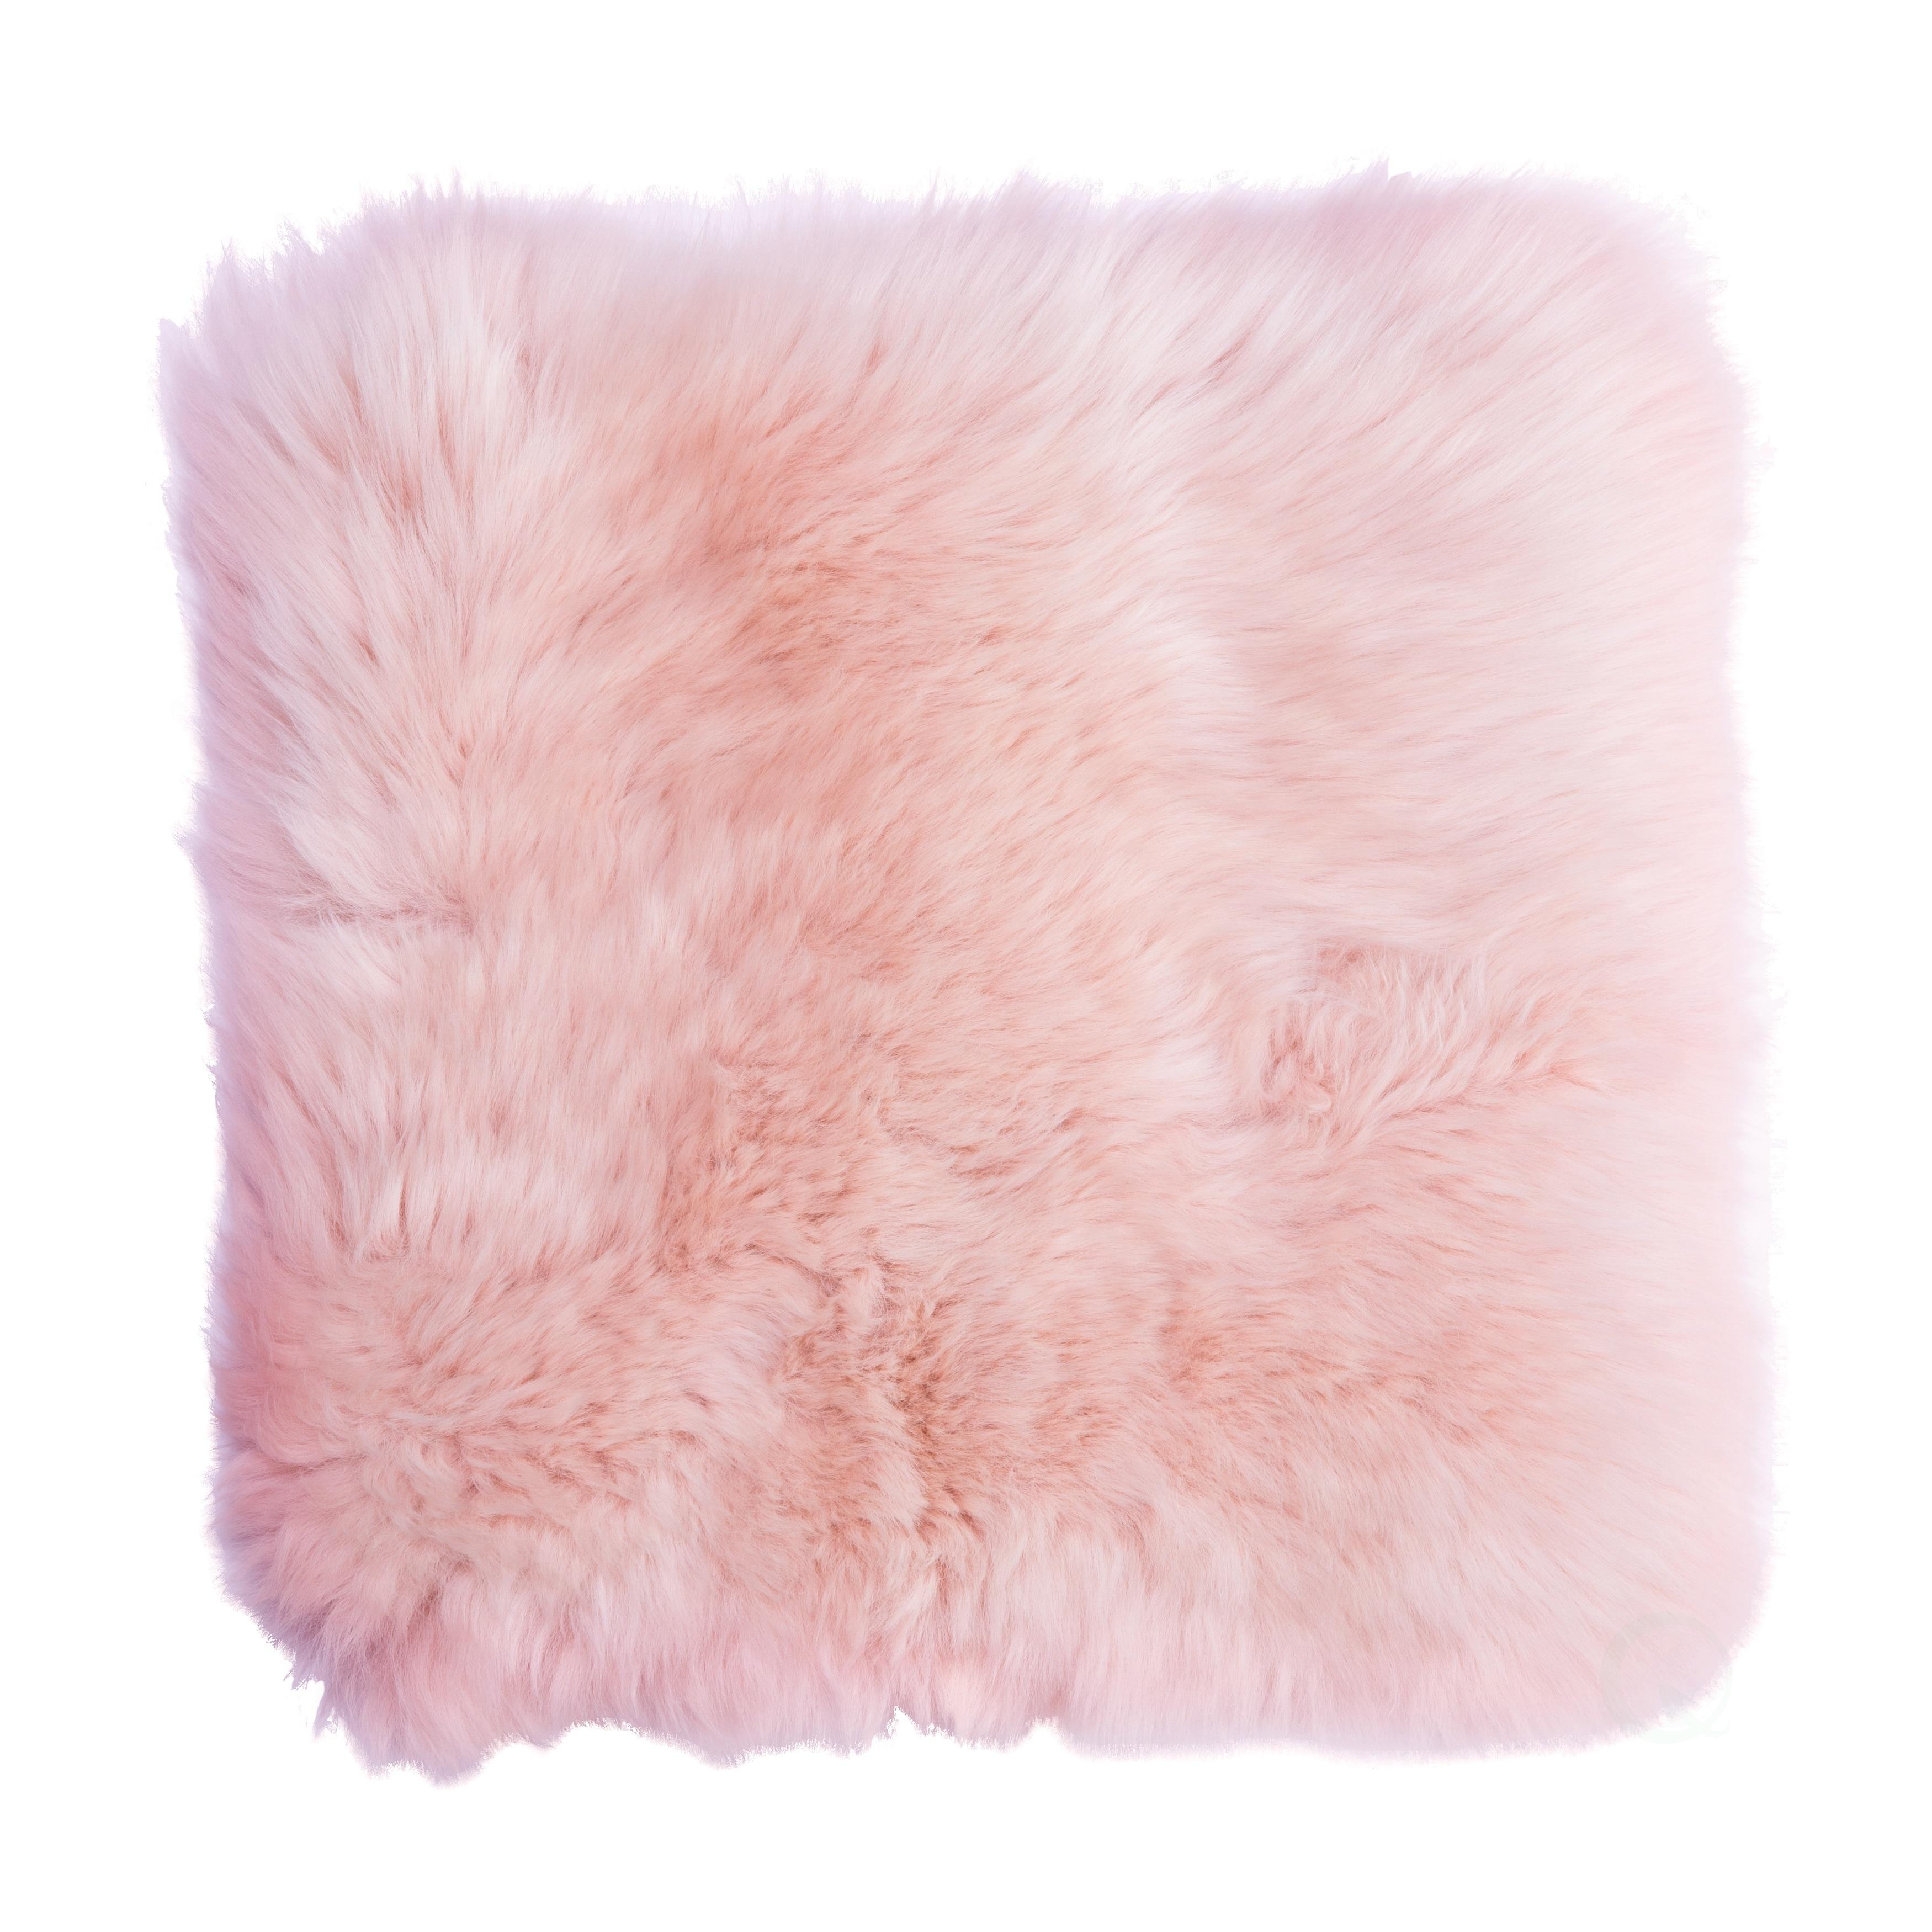 Genuine Australian Lamb Wool Sheepskin Square Pillow Cover 16 In Overstock 27989243